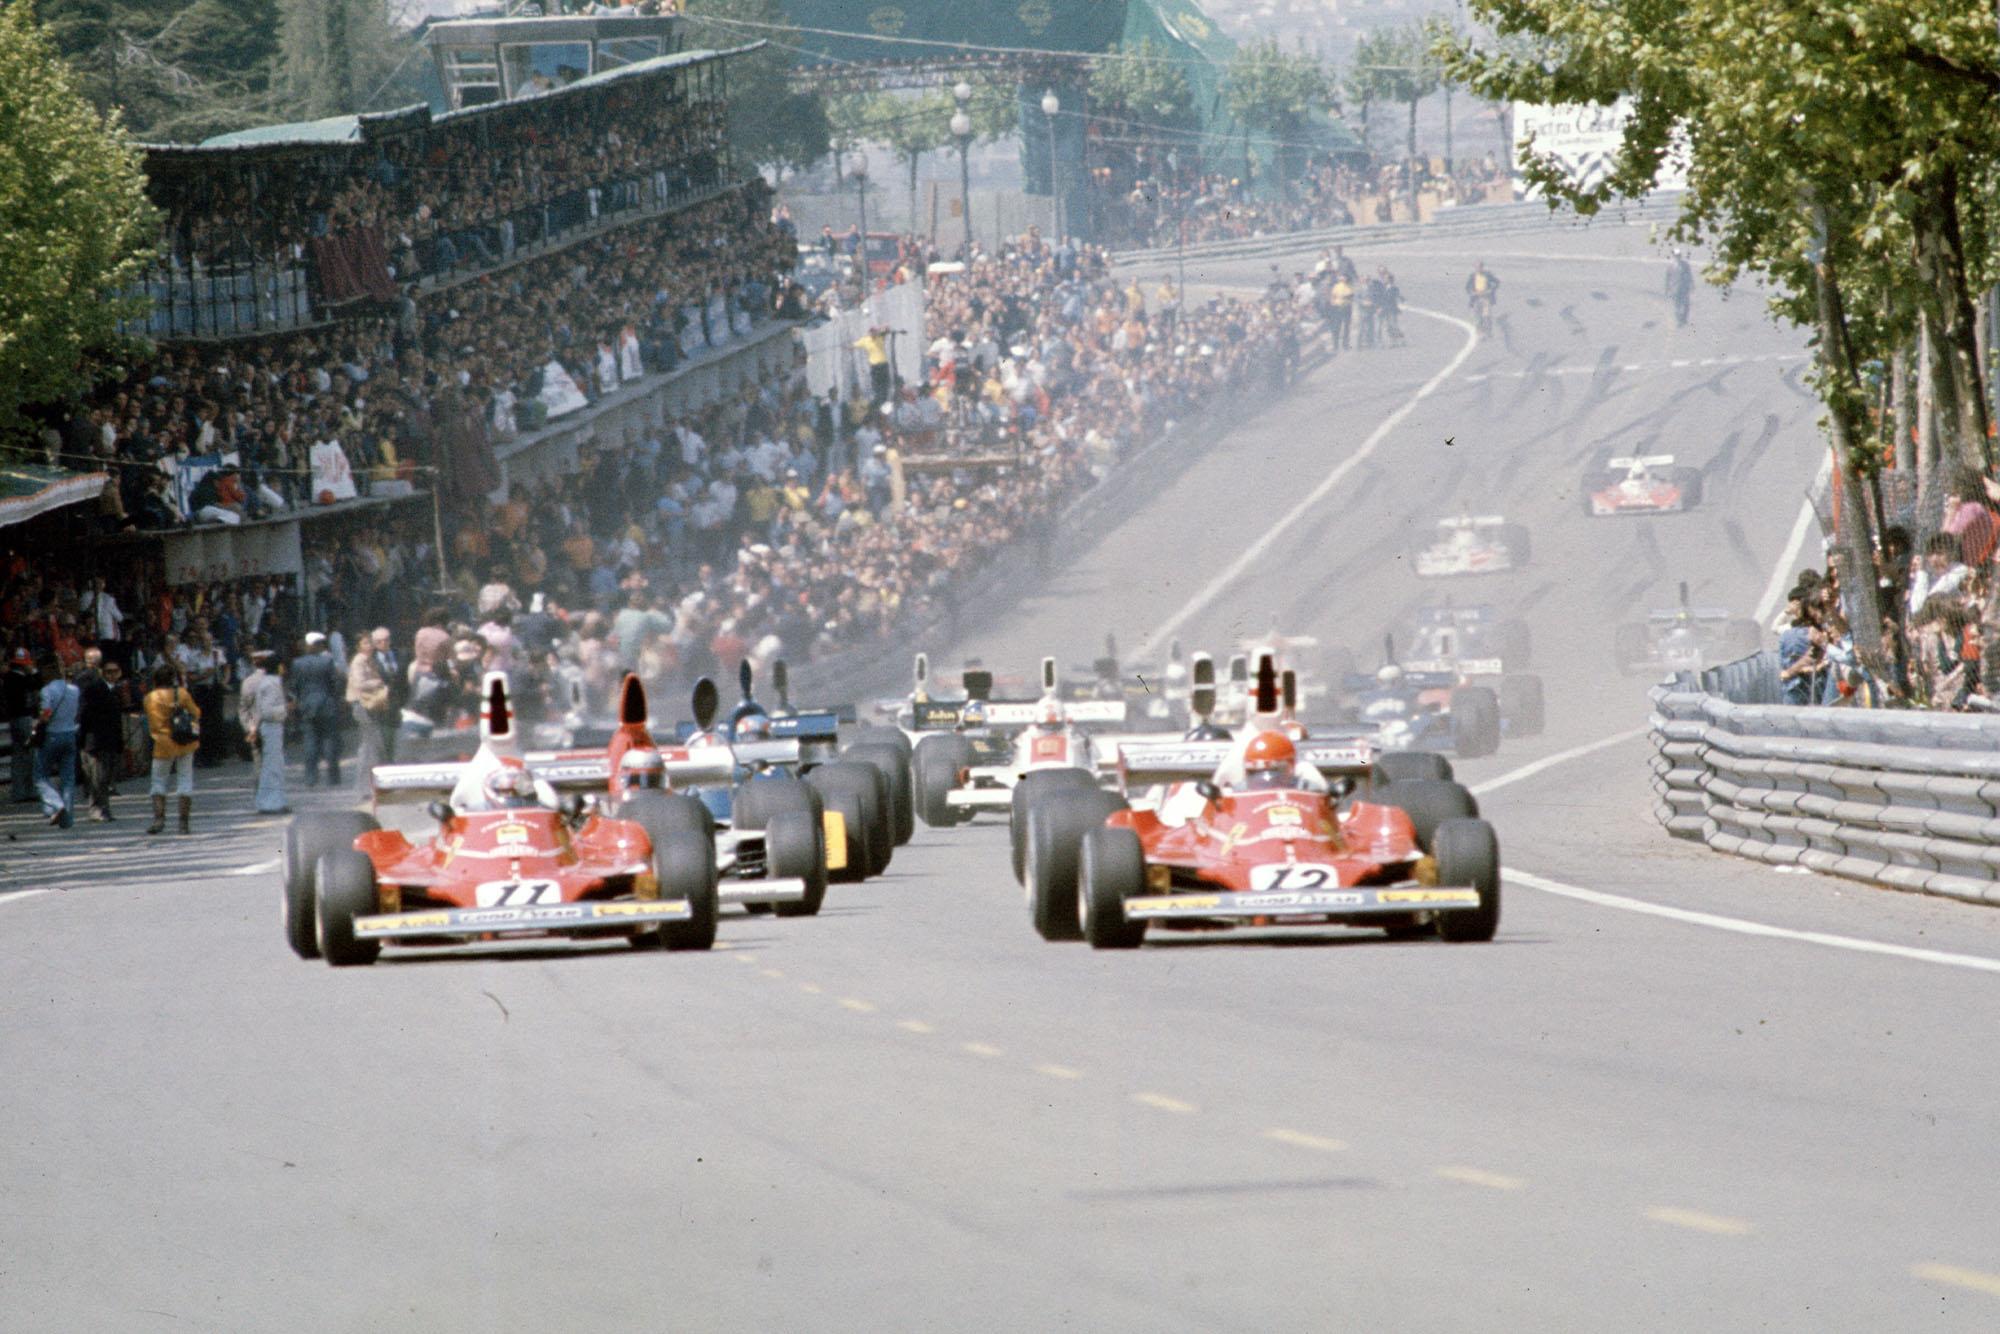 Niki Lauda leads at the start of the 1975 Spanish Grand Prix, Montjuïc.